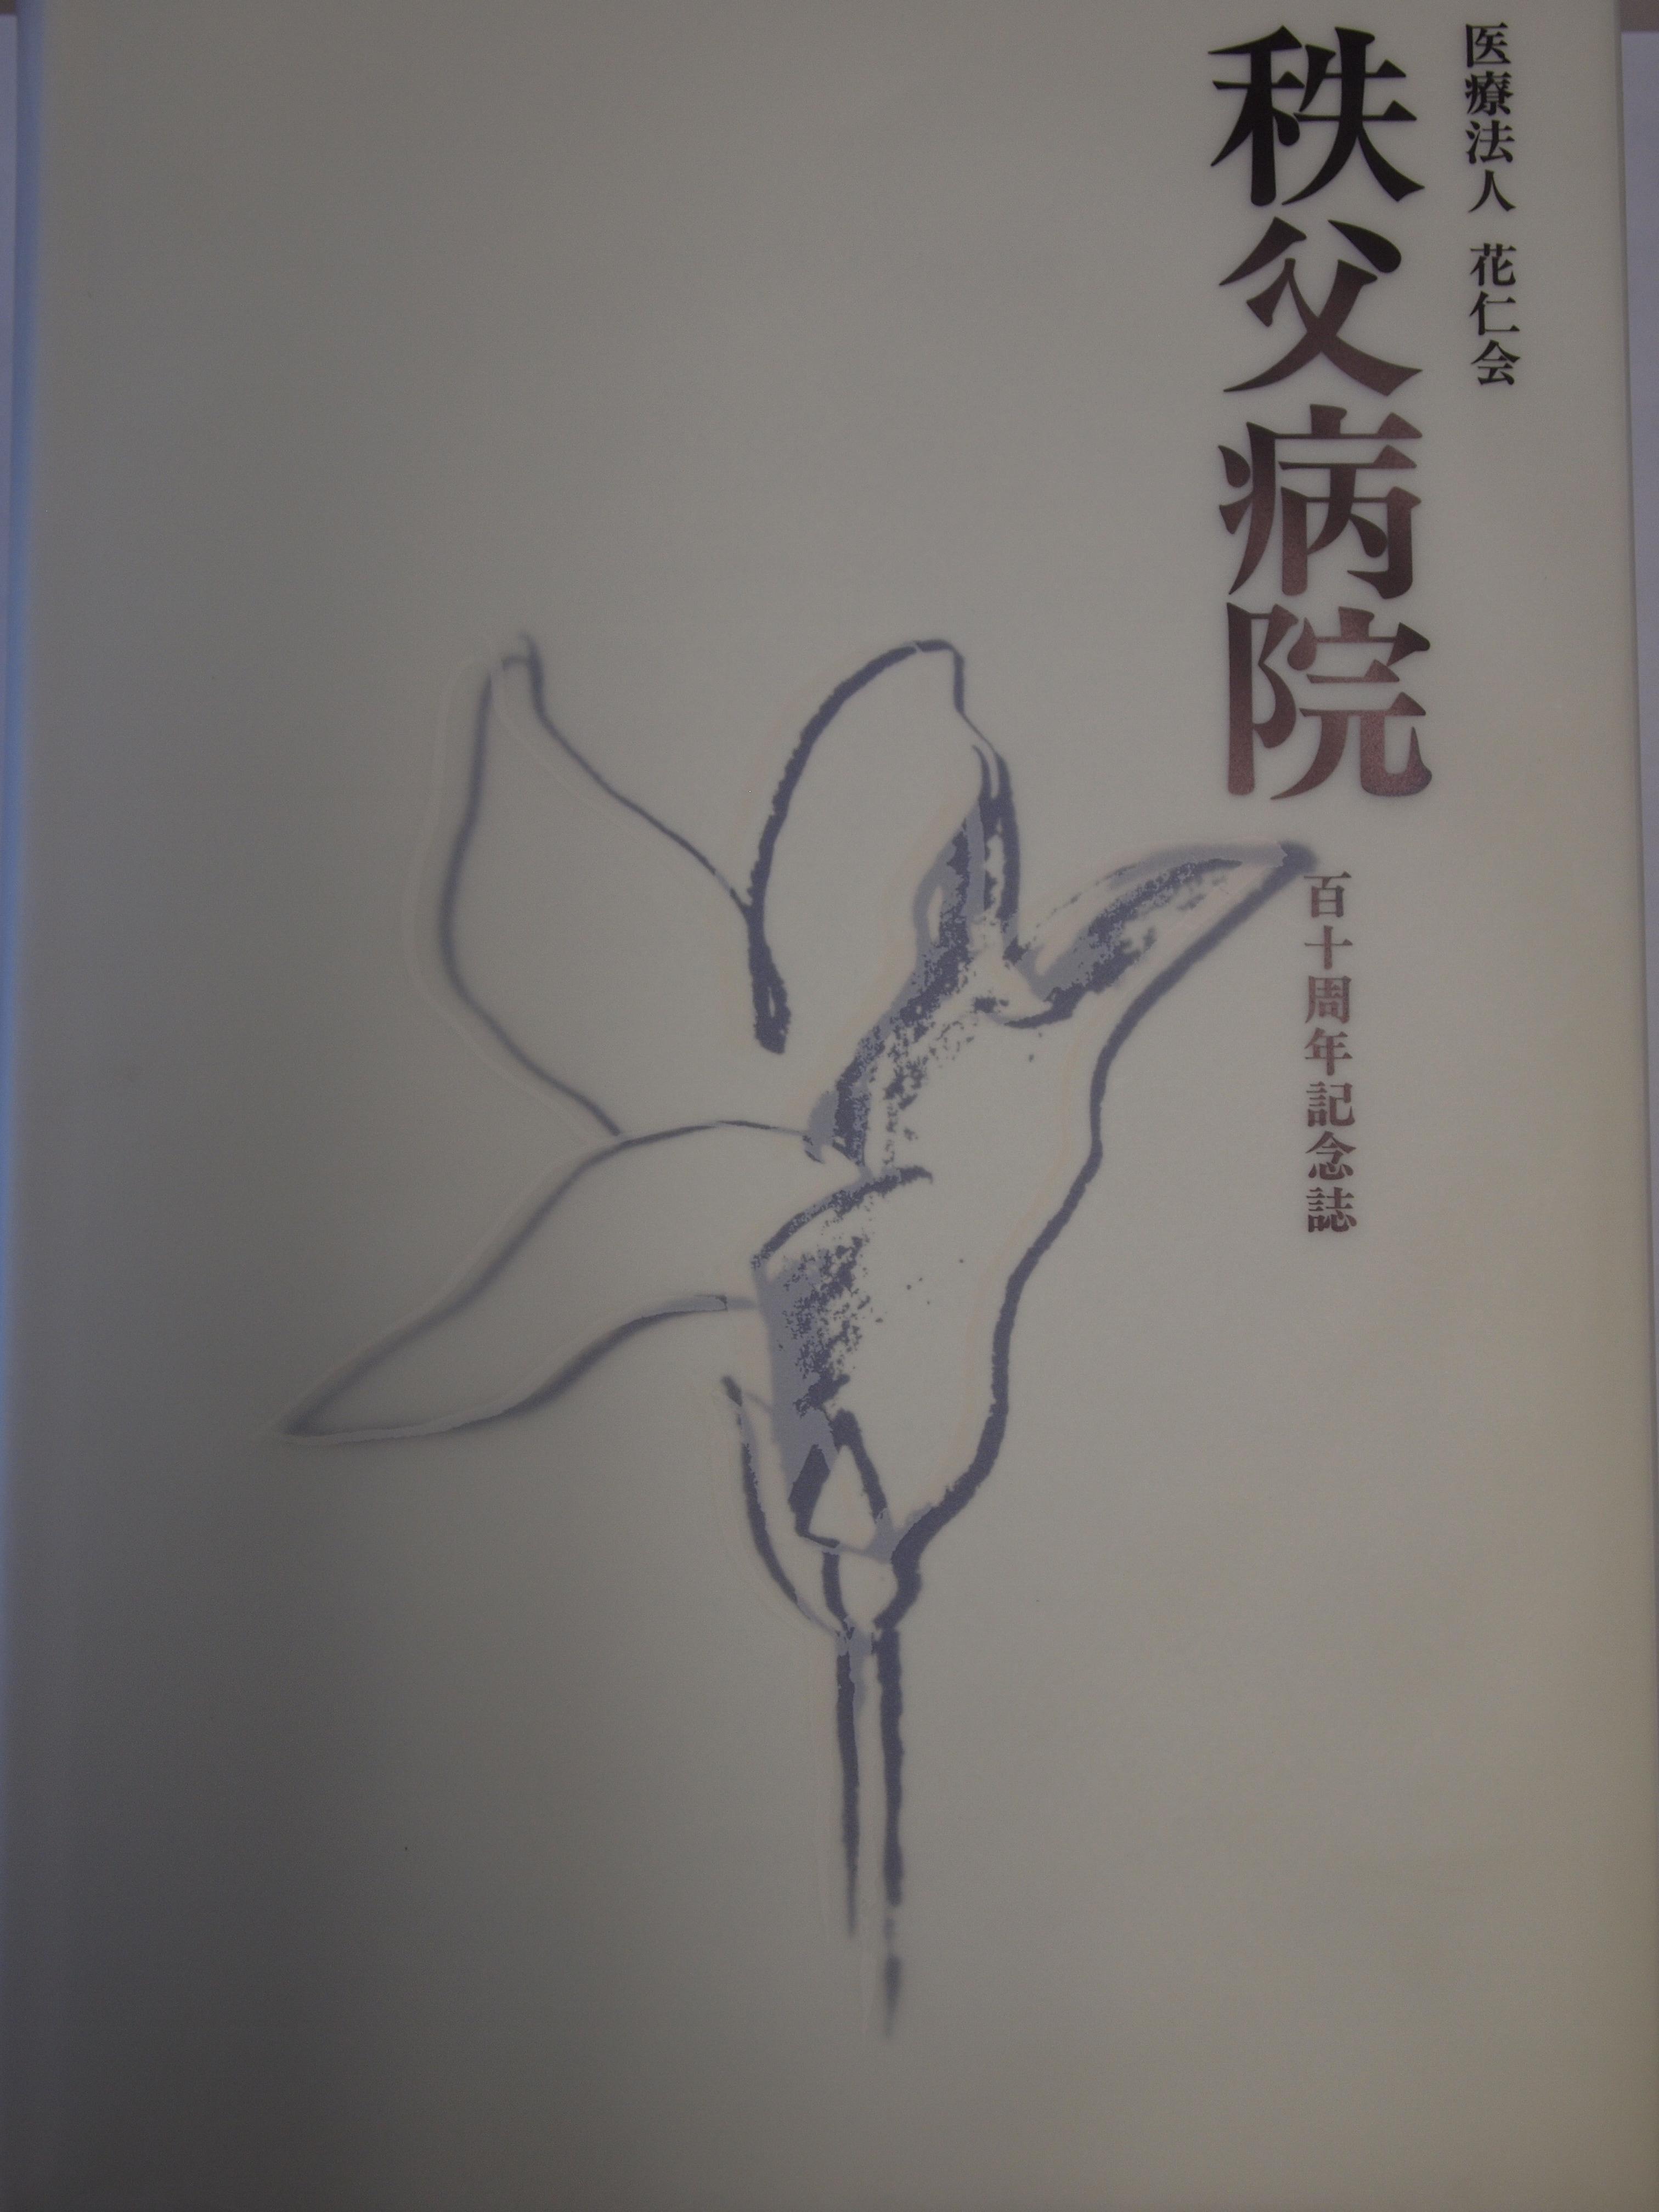 http://chichibu-med.jp/news/PB300740.JPG